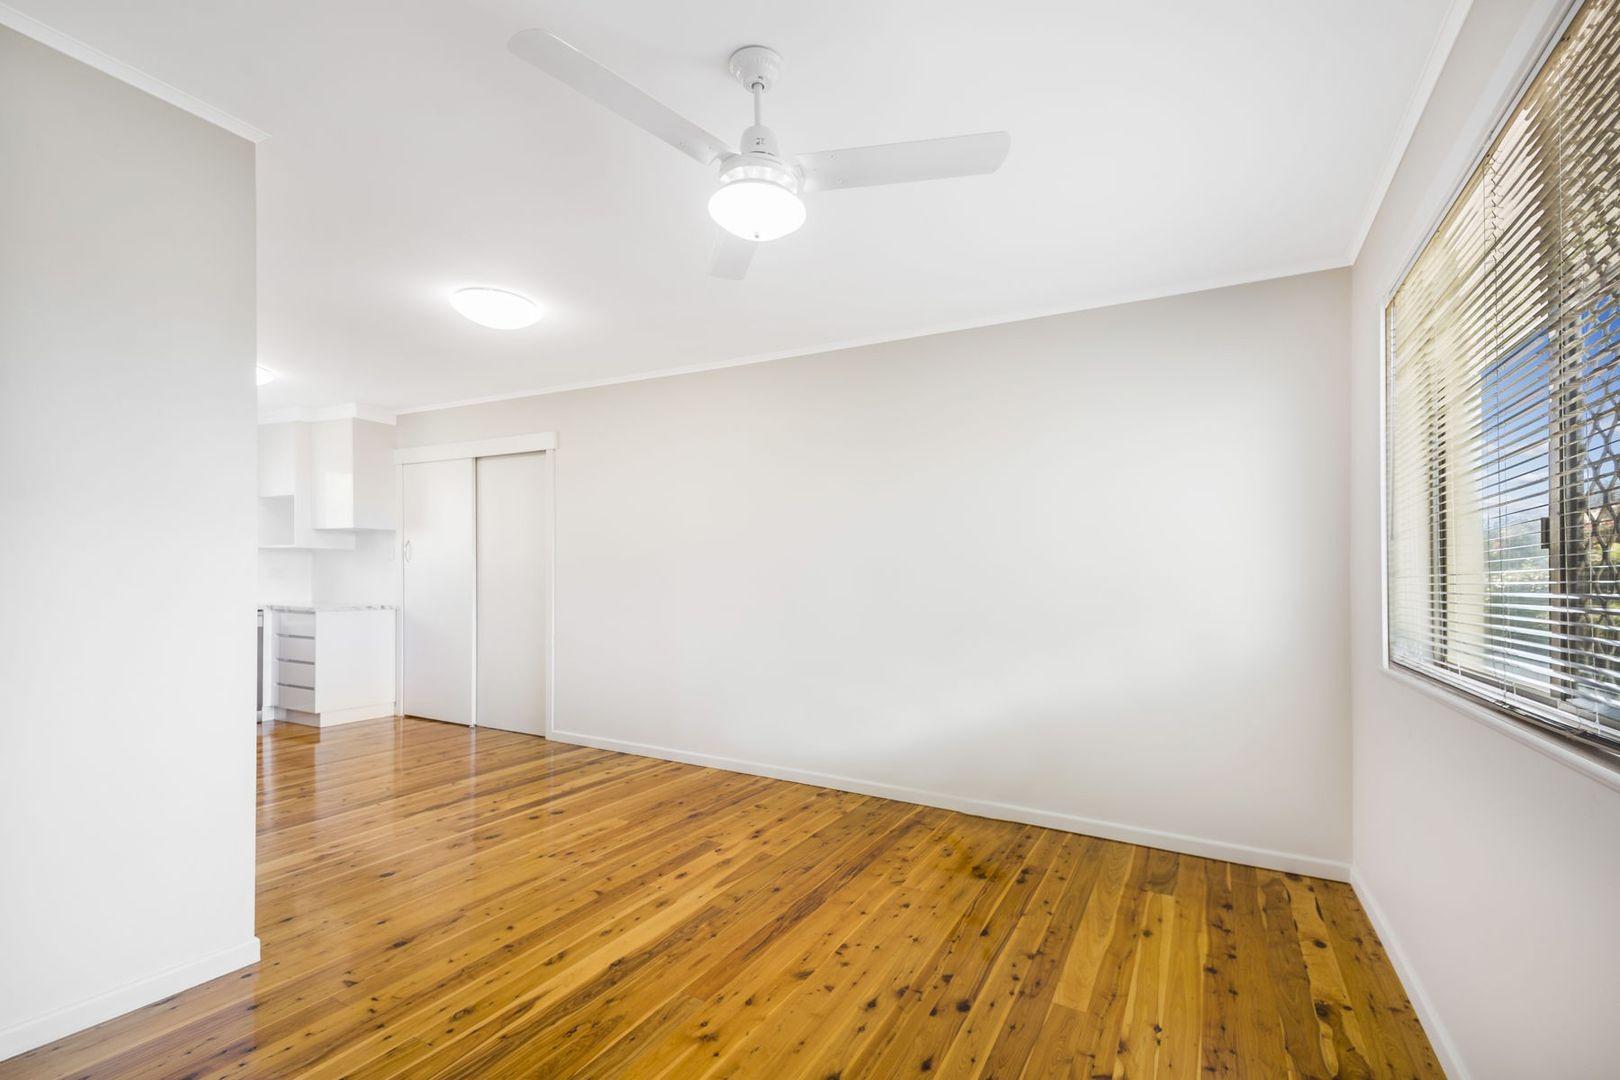 1/23 Leichhardt Street, Centenary Heights QLD 4350, Image 1